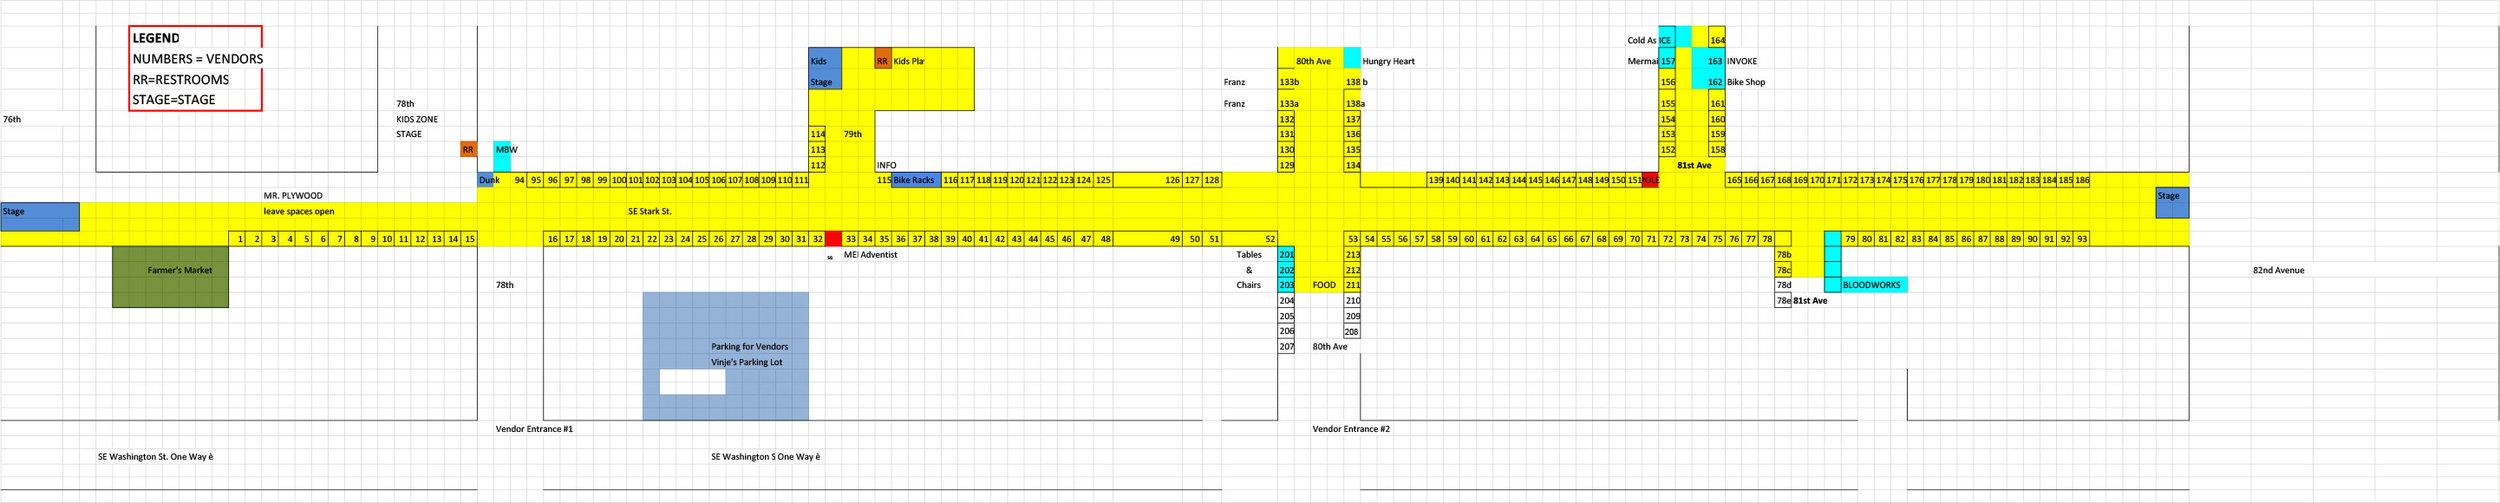 2018-Montavilla-Street-Fair-Vendor-Booth-Assignments---Map.jpg